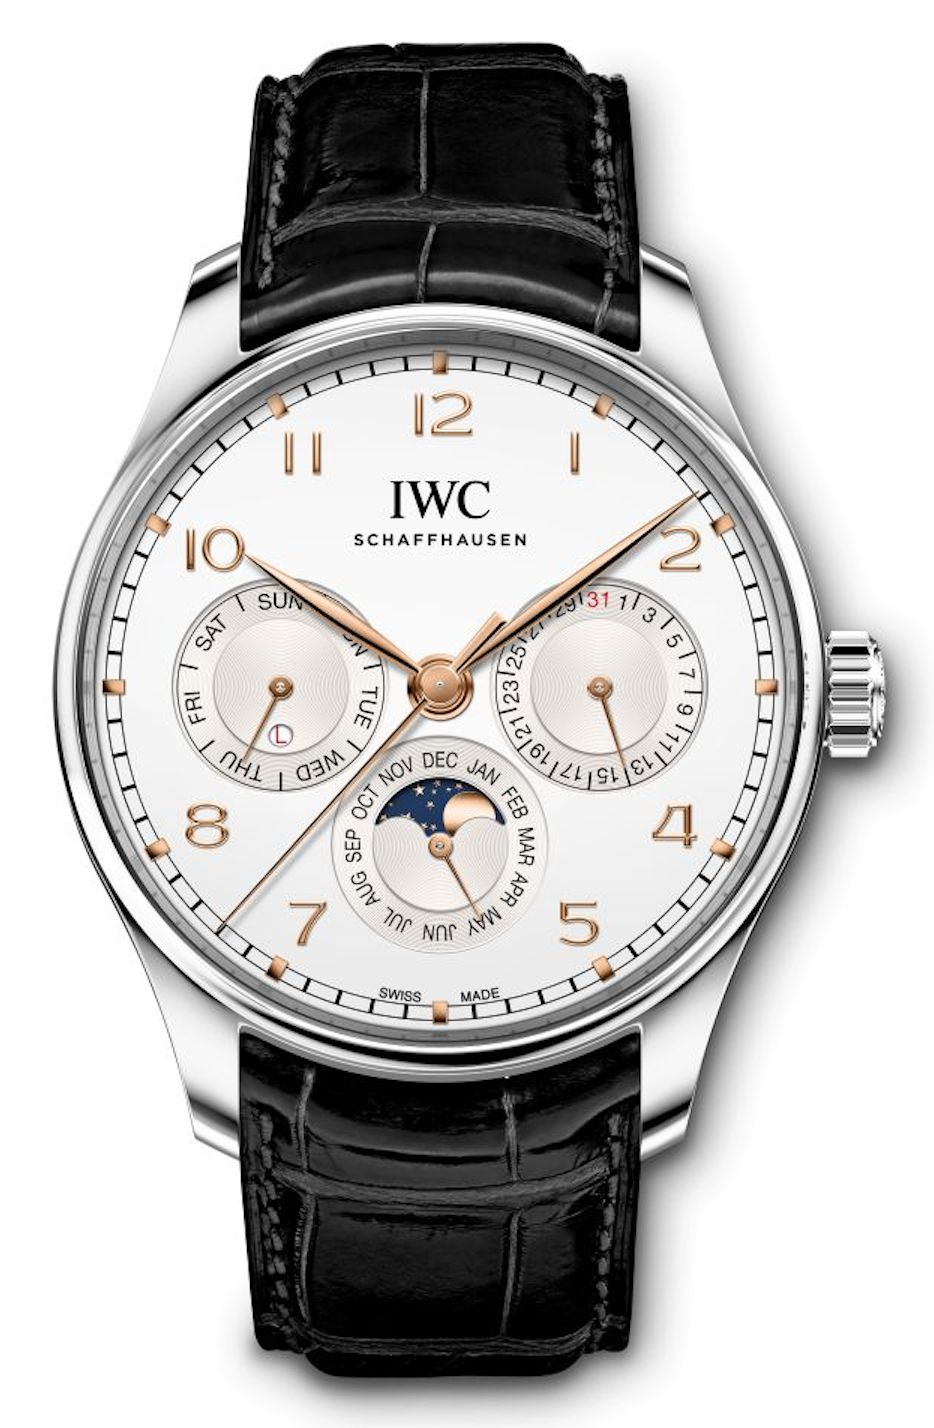 New 2020 IWC Portugieser  Perpetual Calendar 42 Watch models - stainless steel